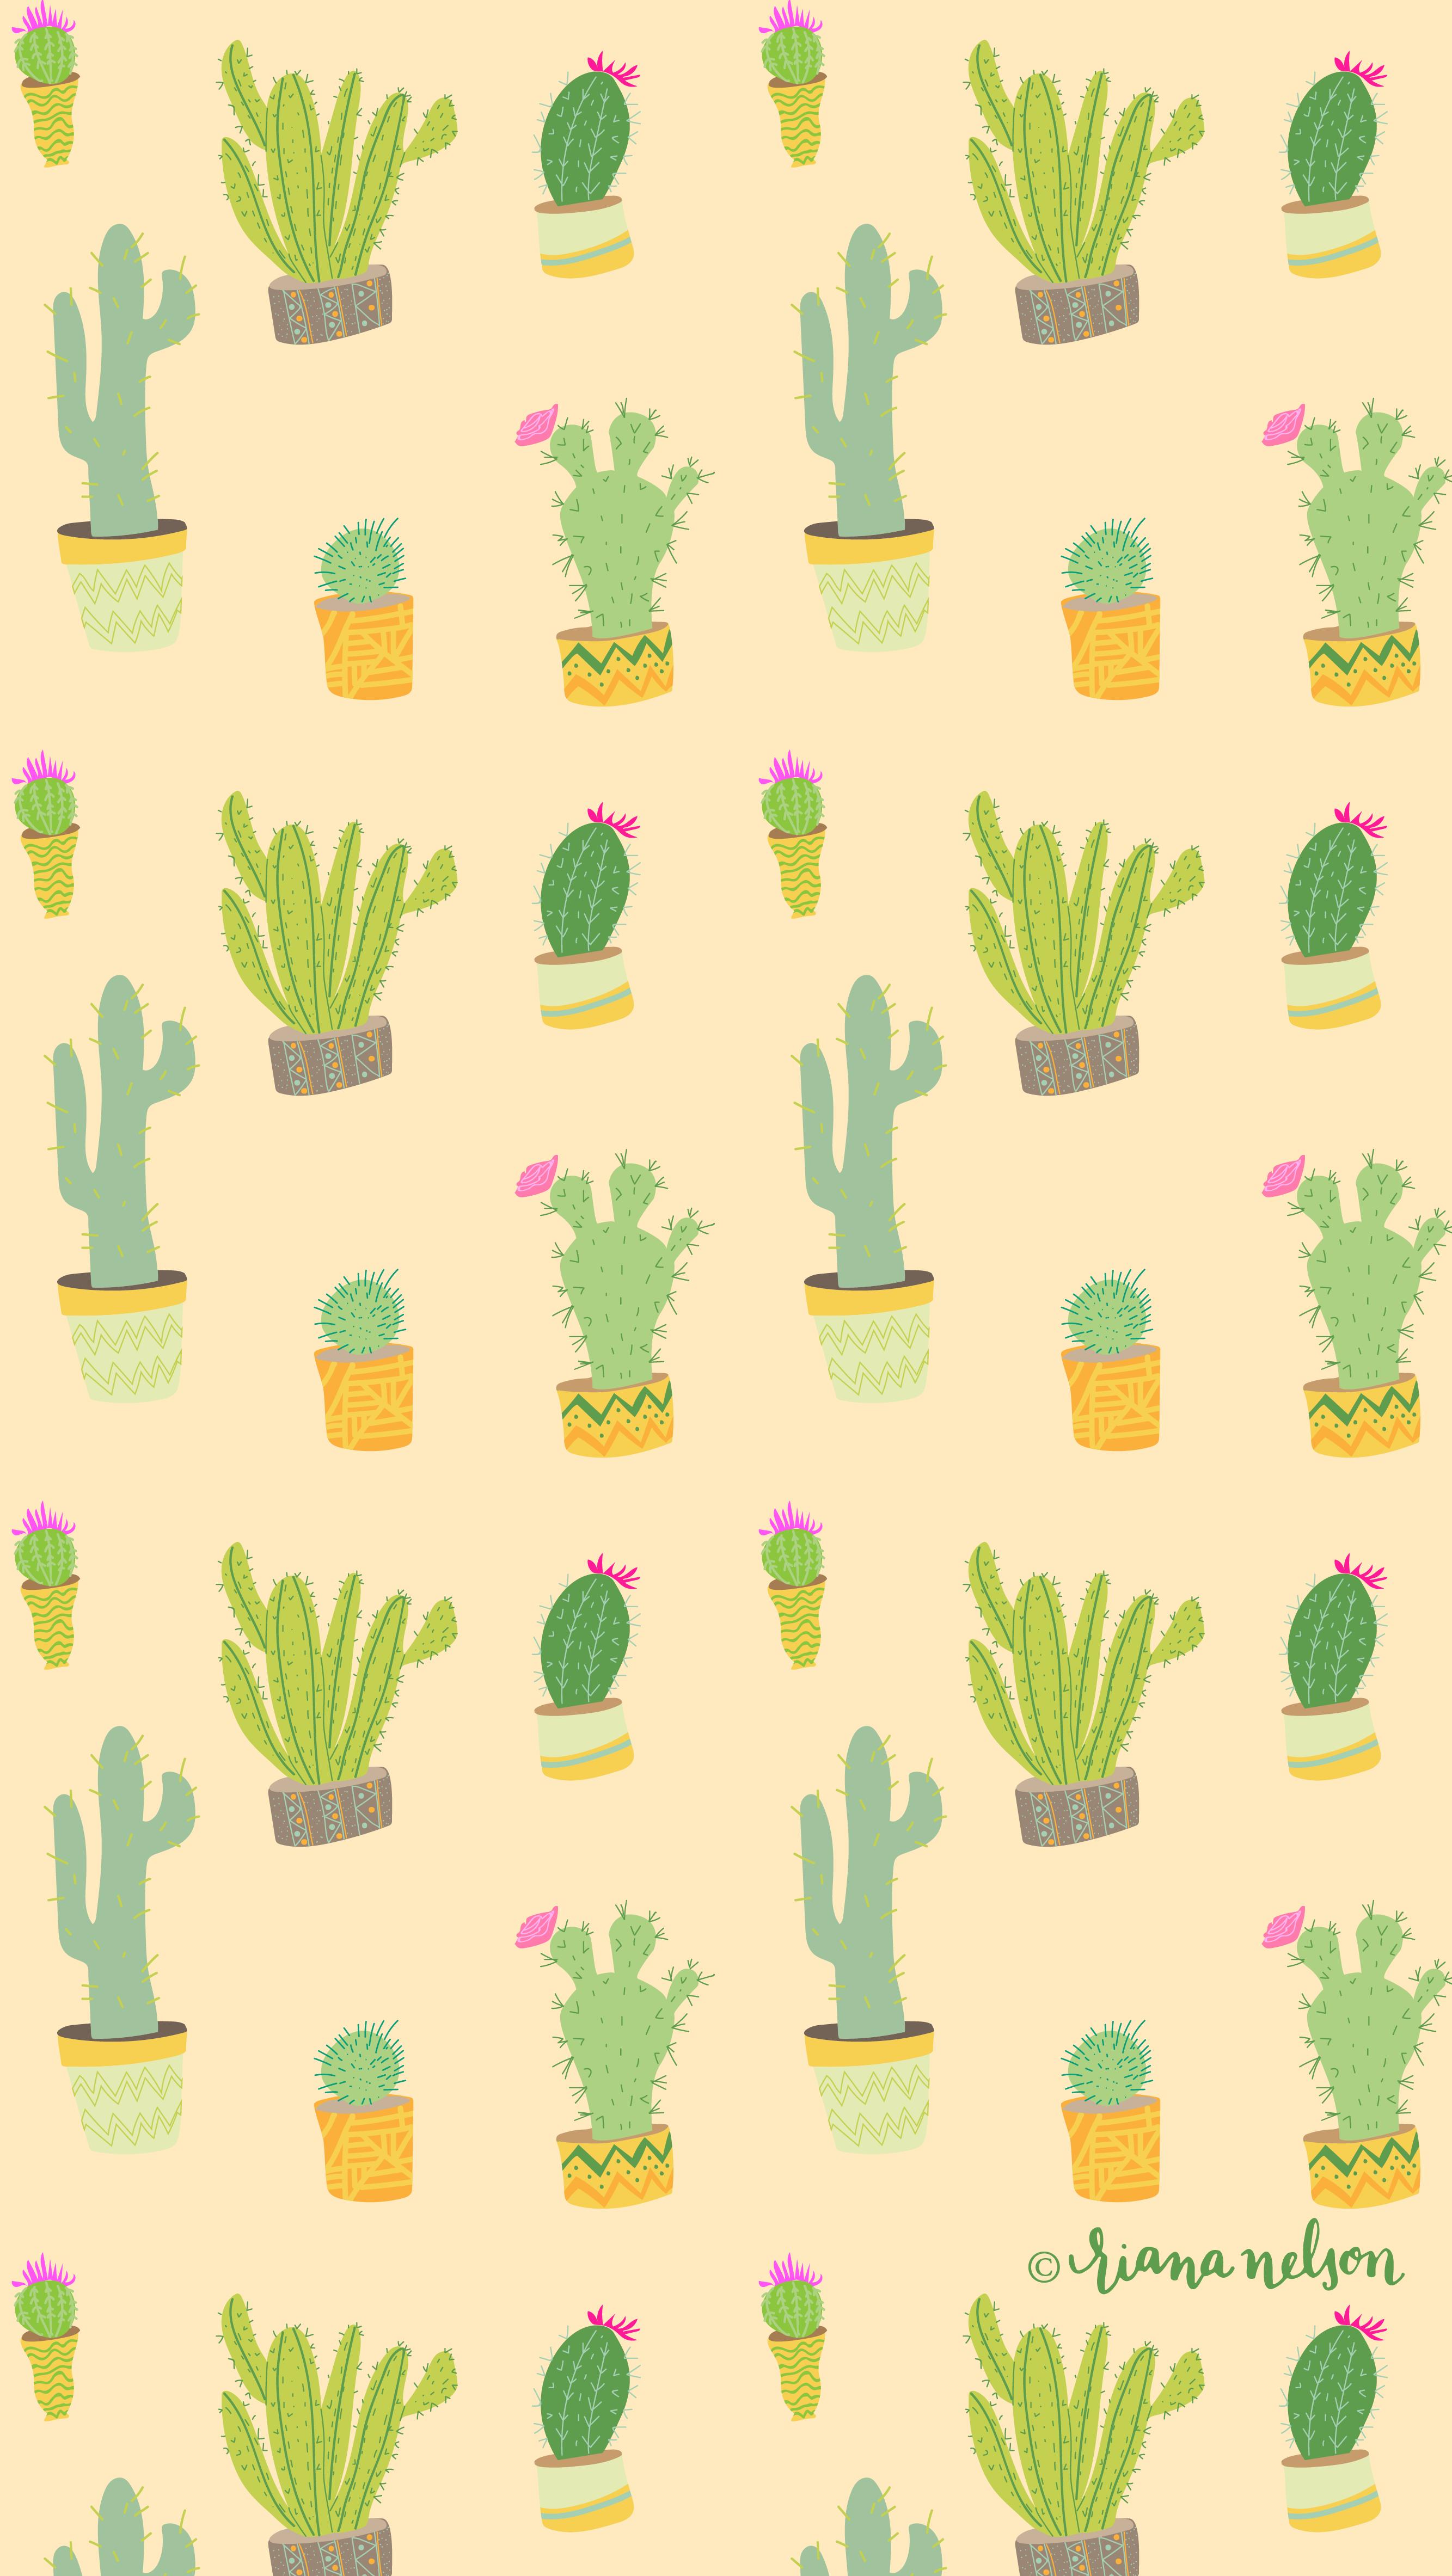 Cacti Party Wallpaper Riana Nelson